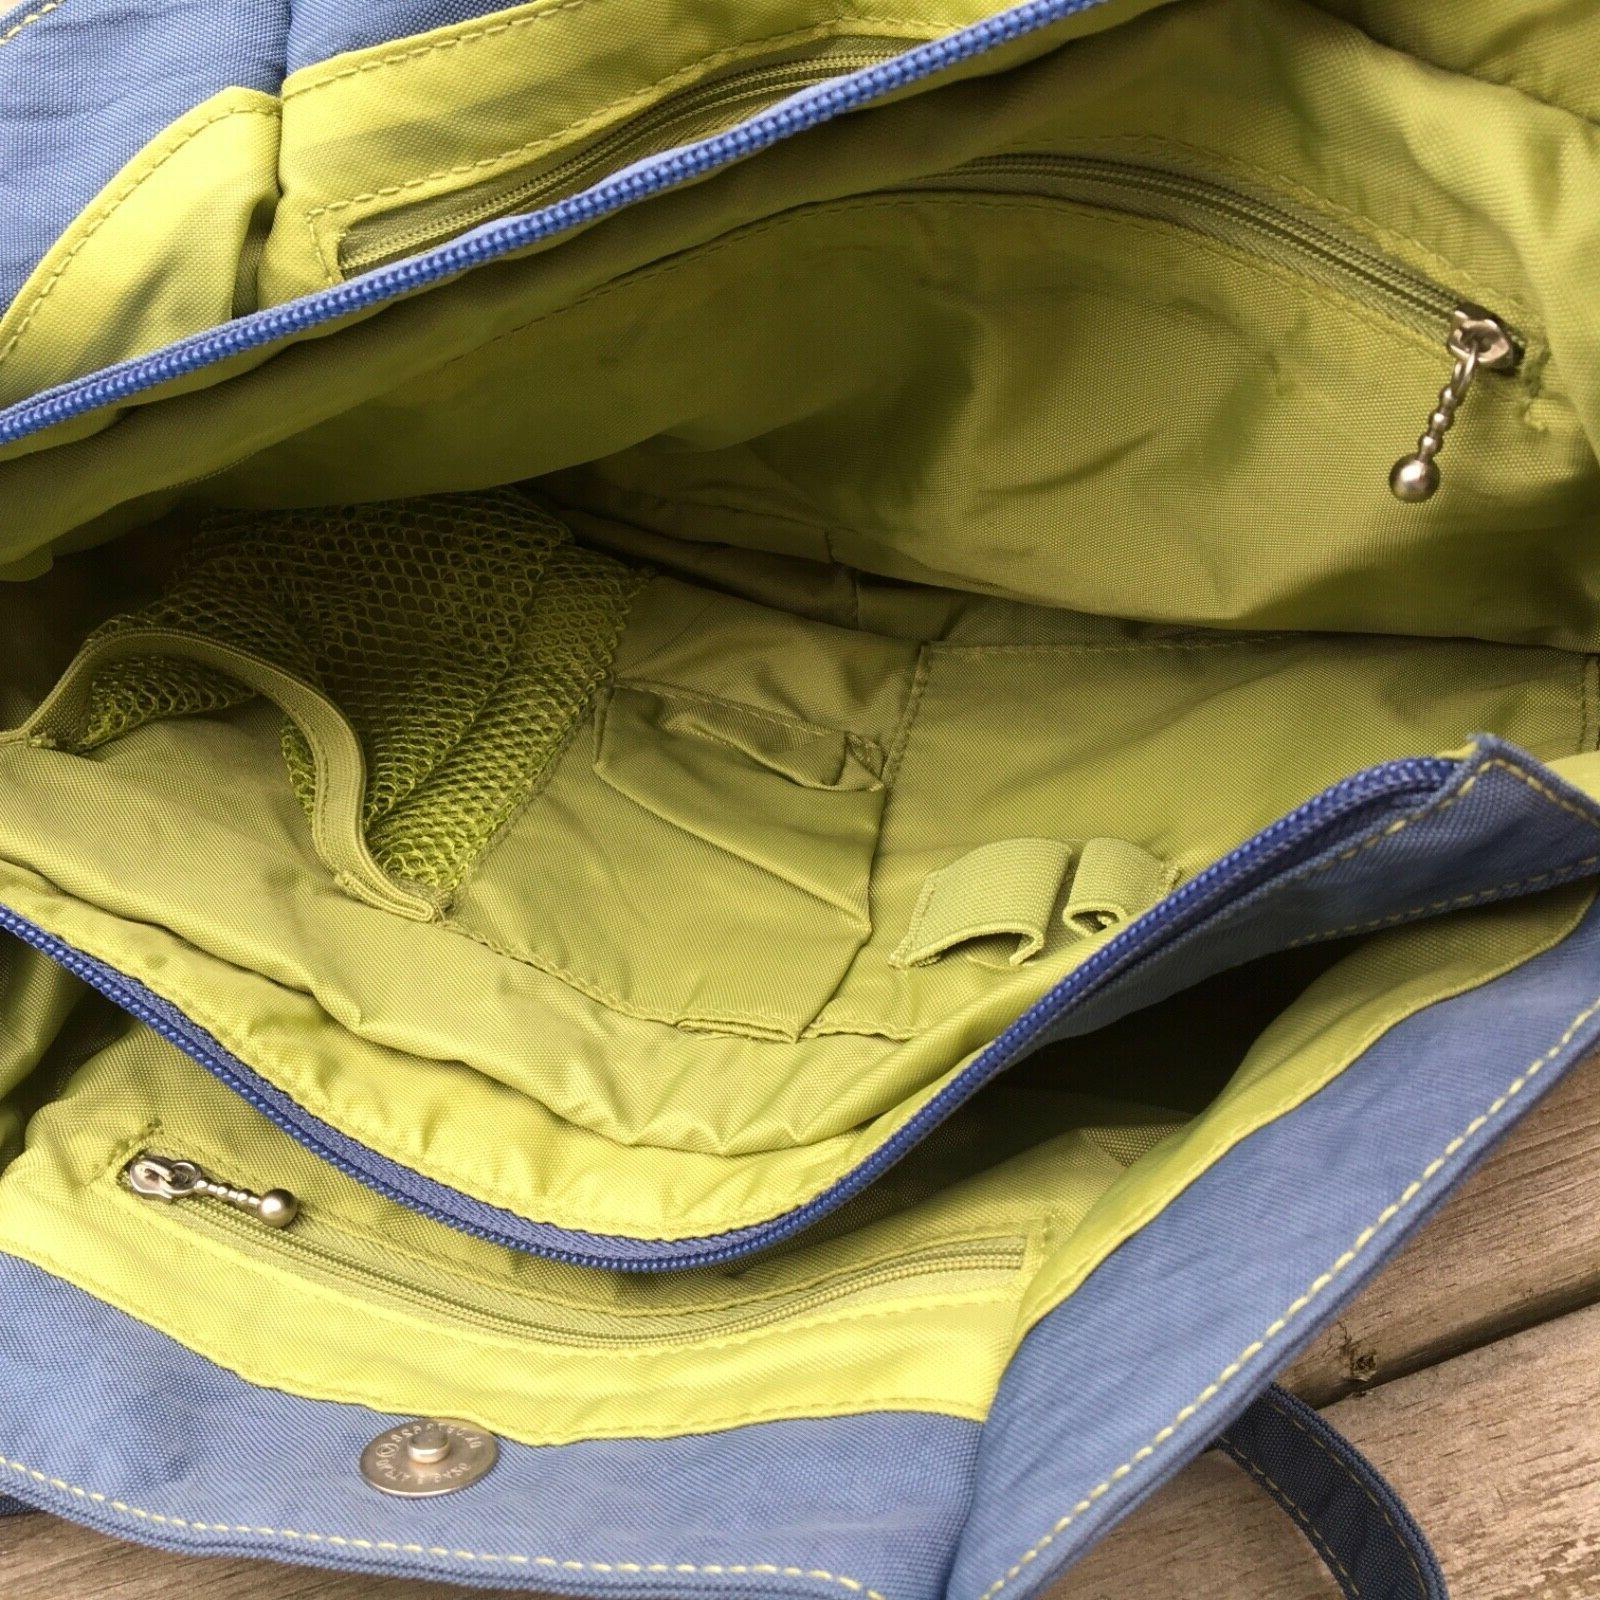 Baggallini Satchel Handbag Slate